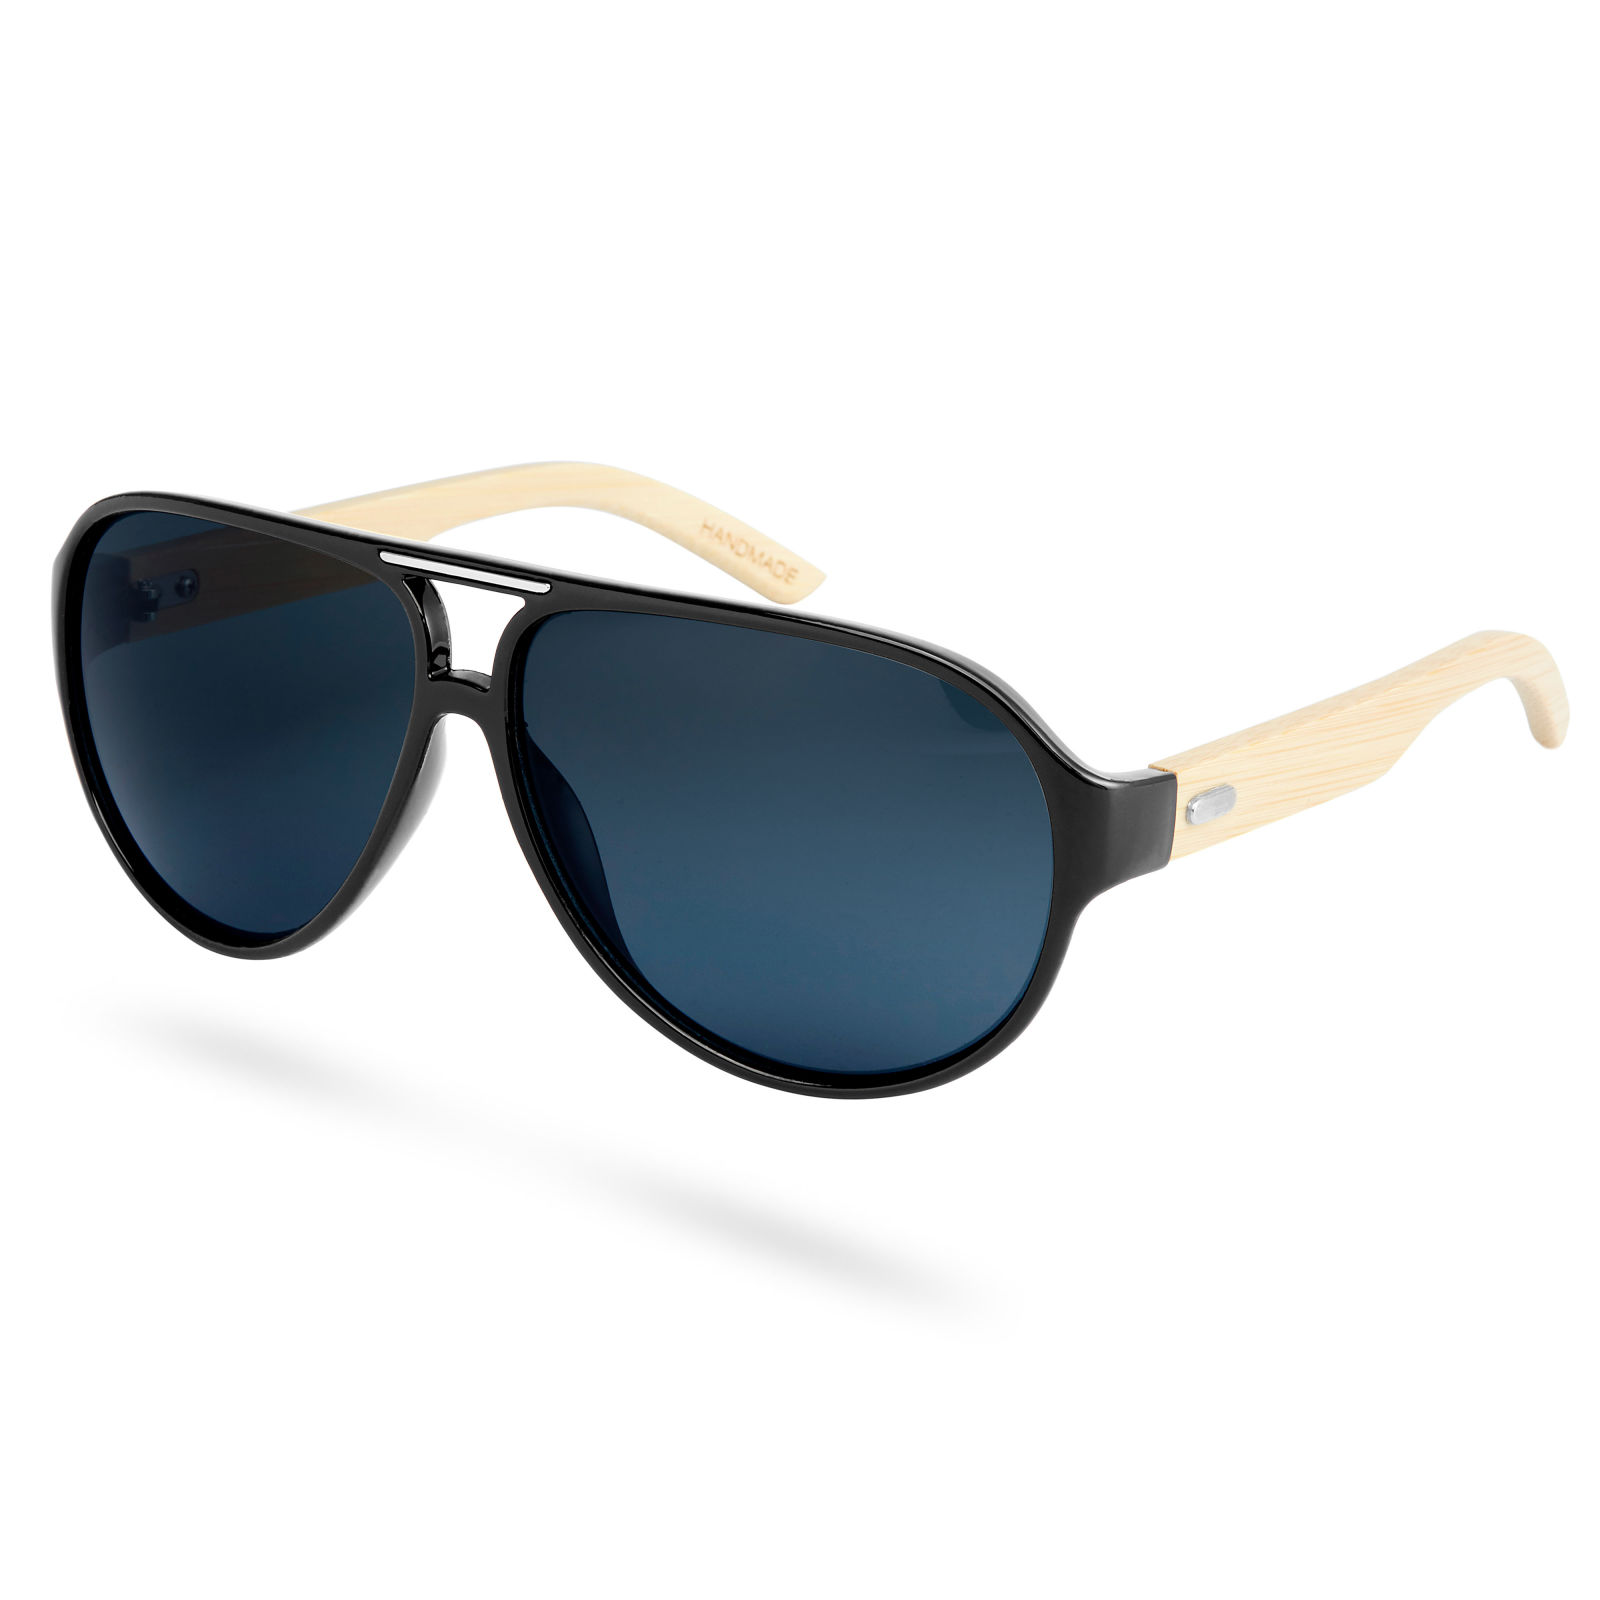 6206eac6a1 Μαύρα   Μπεζ Γυαλιά Ηλίου Bamboo Smoke